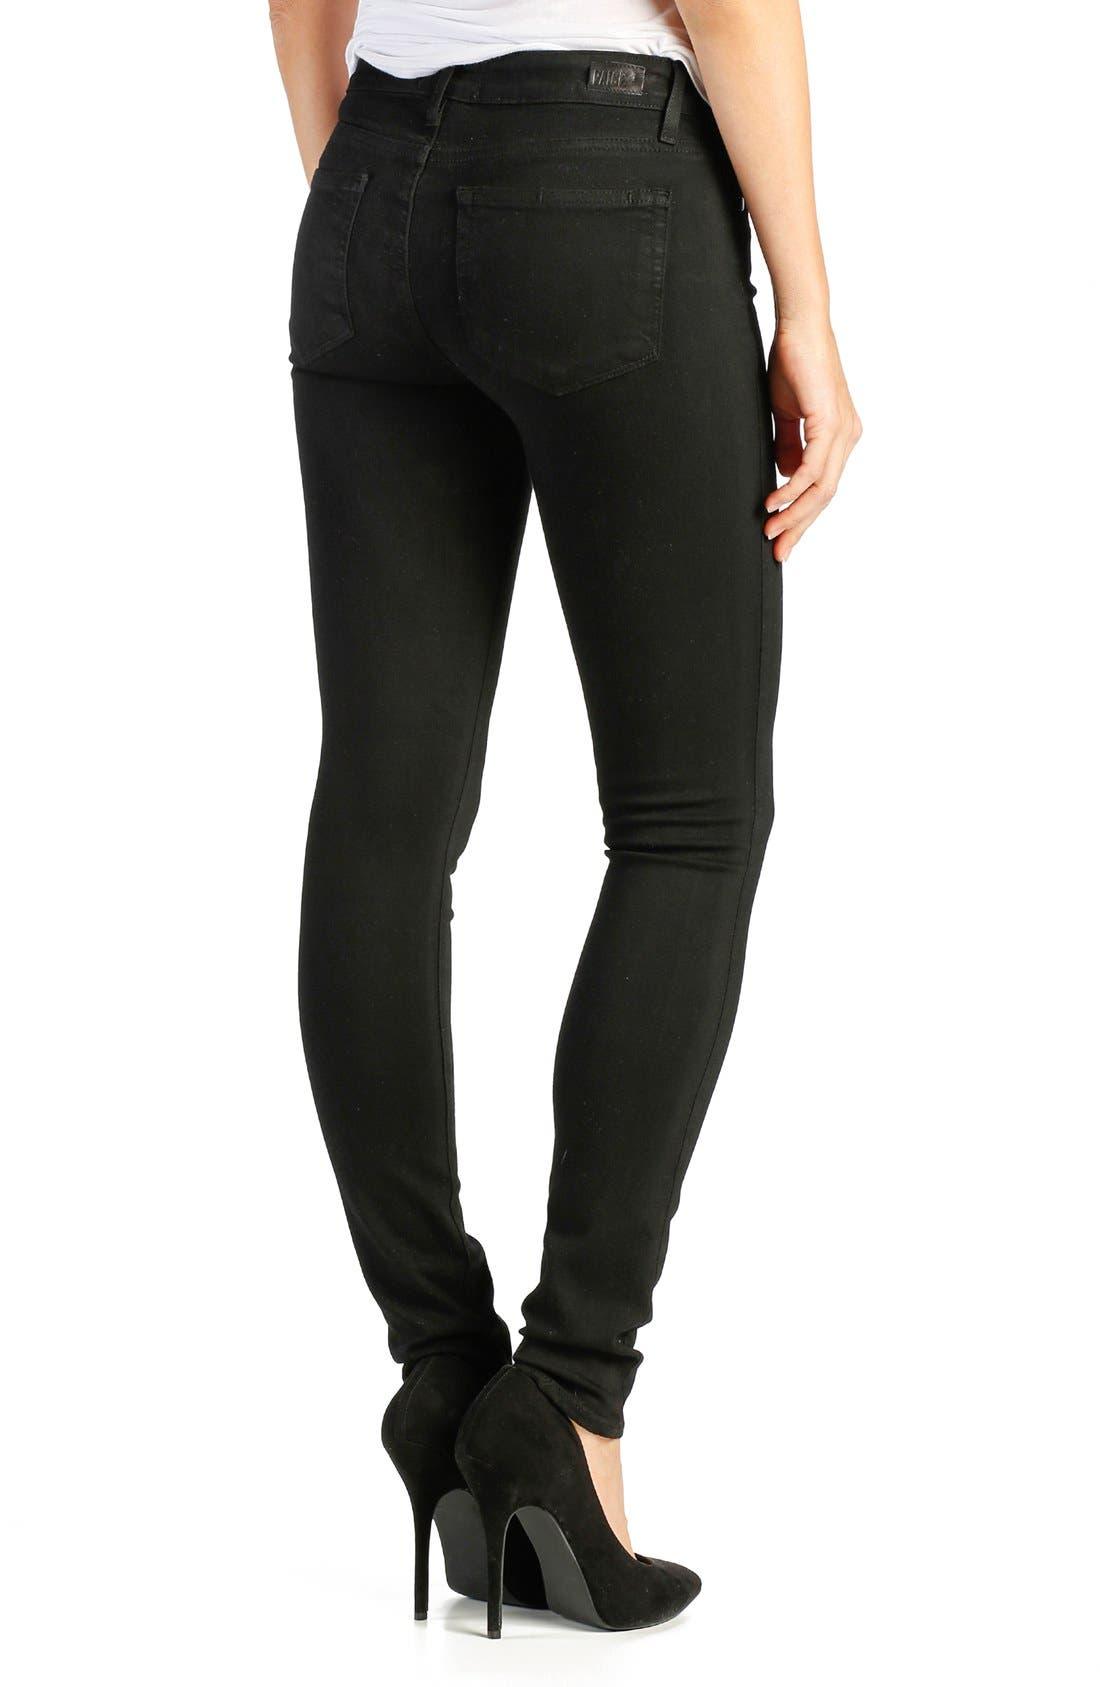 PAIGE,                             Transcend -Leggy Ultra Skinny Jeans,                             Alternate thumbnail 2, color,                             BLACK SHADOW